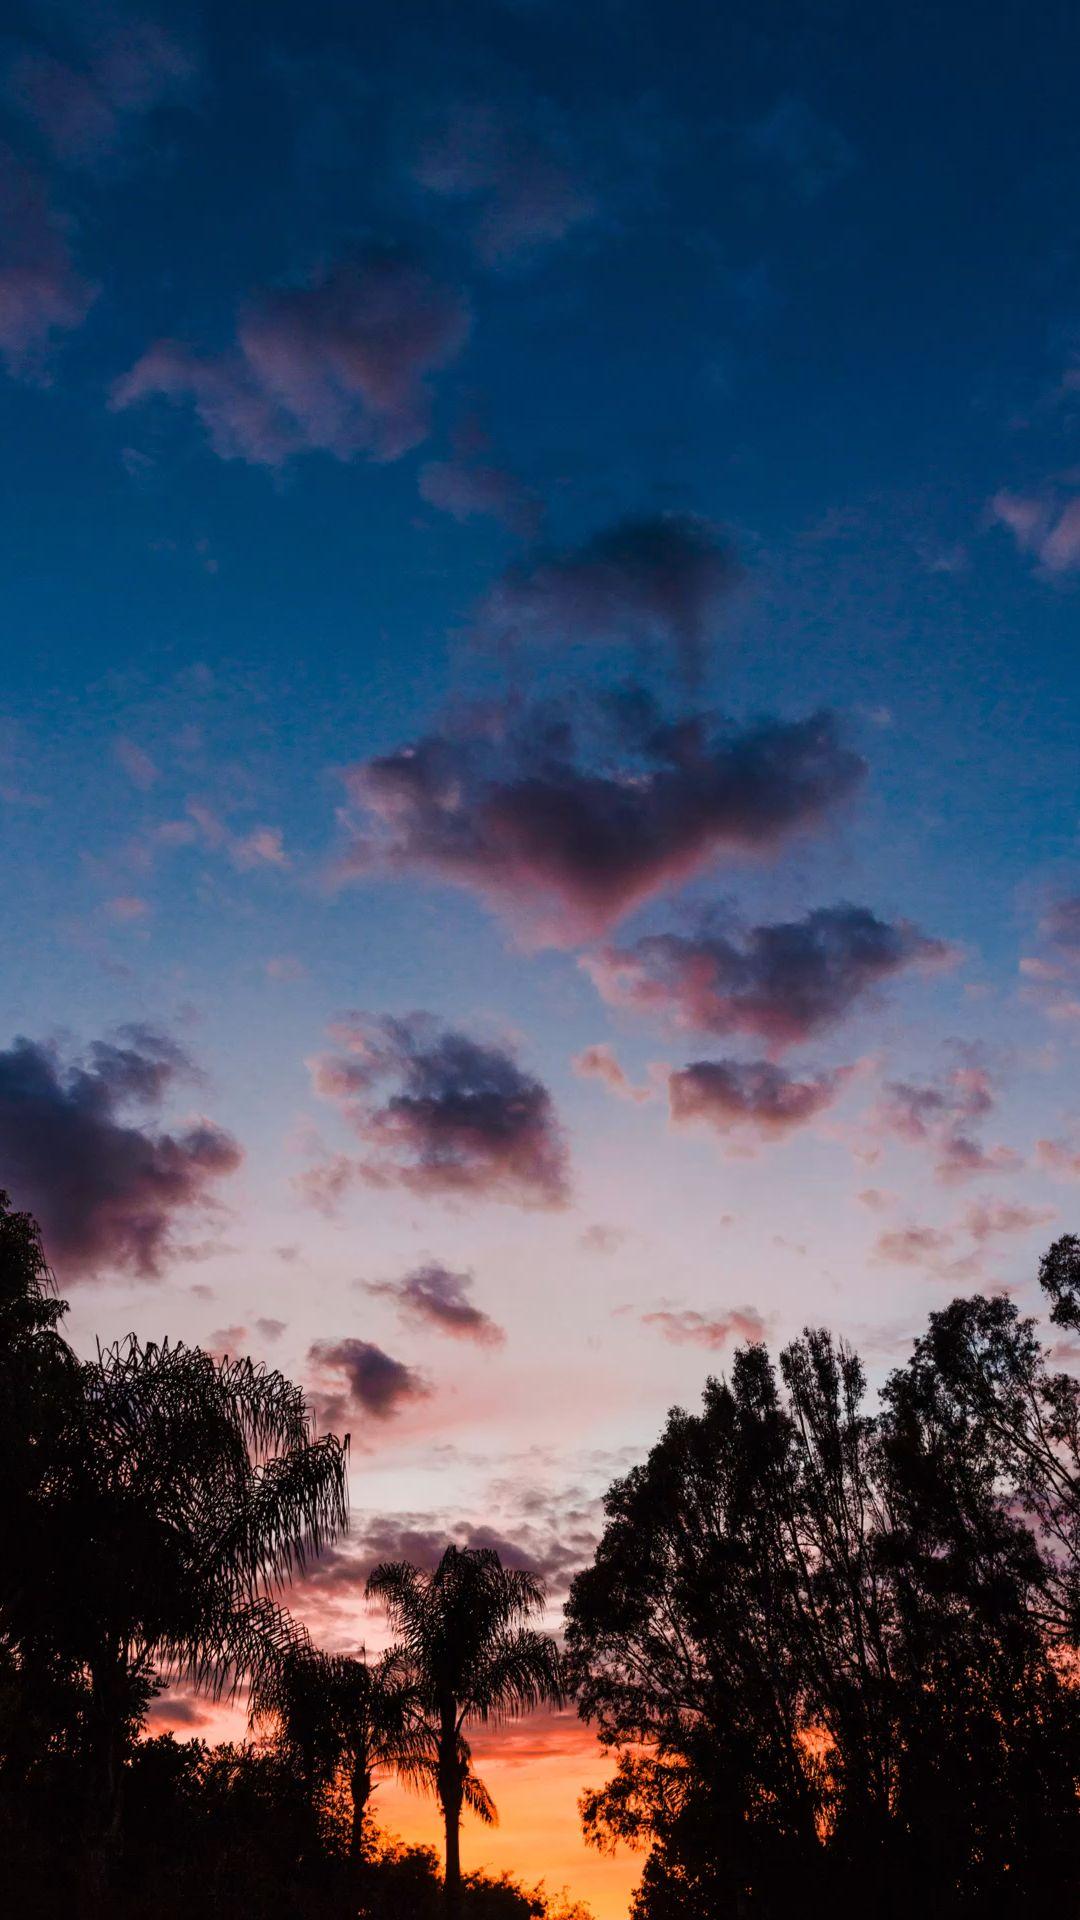 San Diego Oceanside Sunset | Travel Photography by Lenka Vodicka of Lenkaland Photo in California